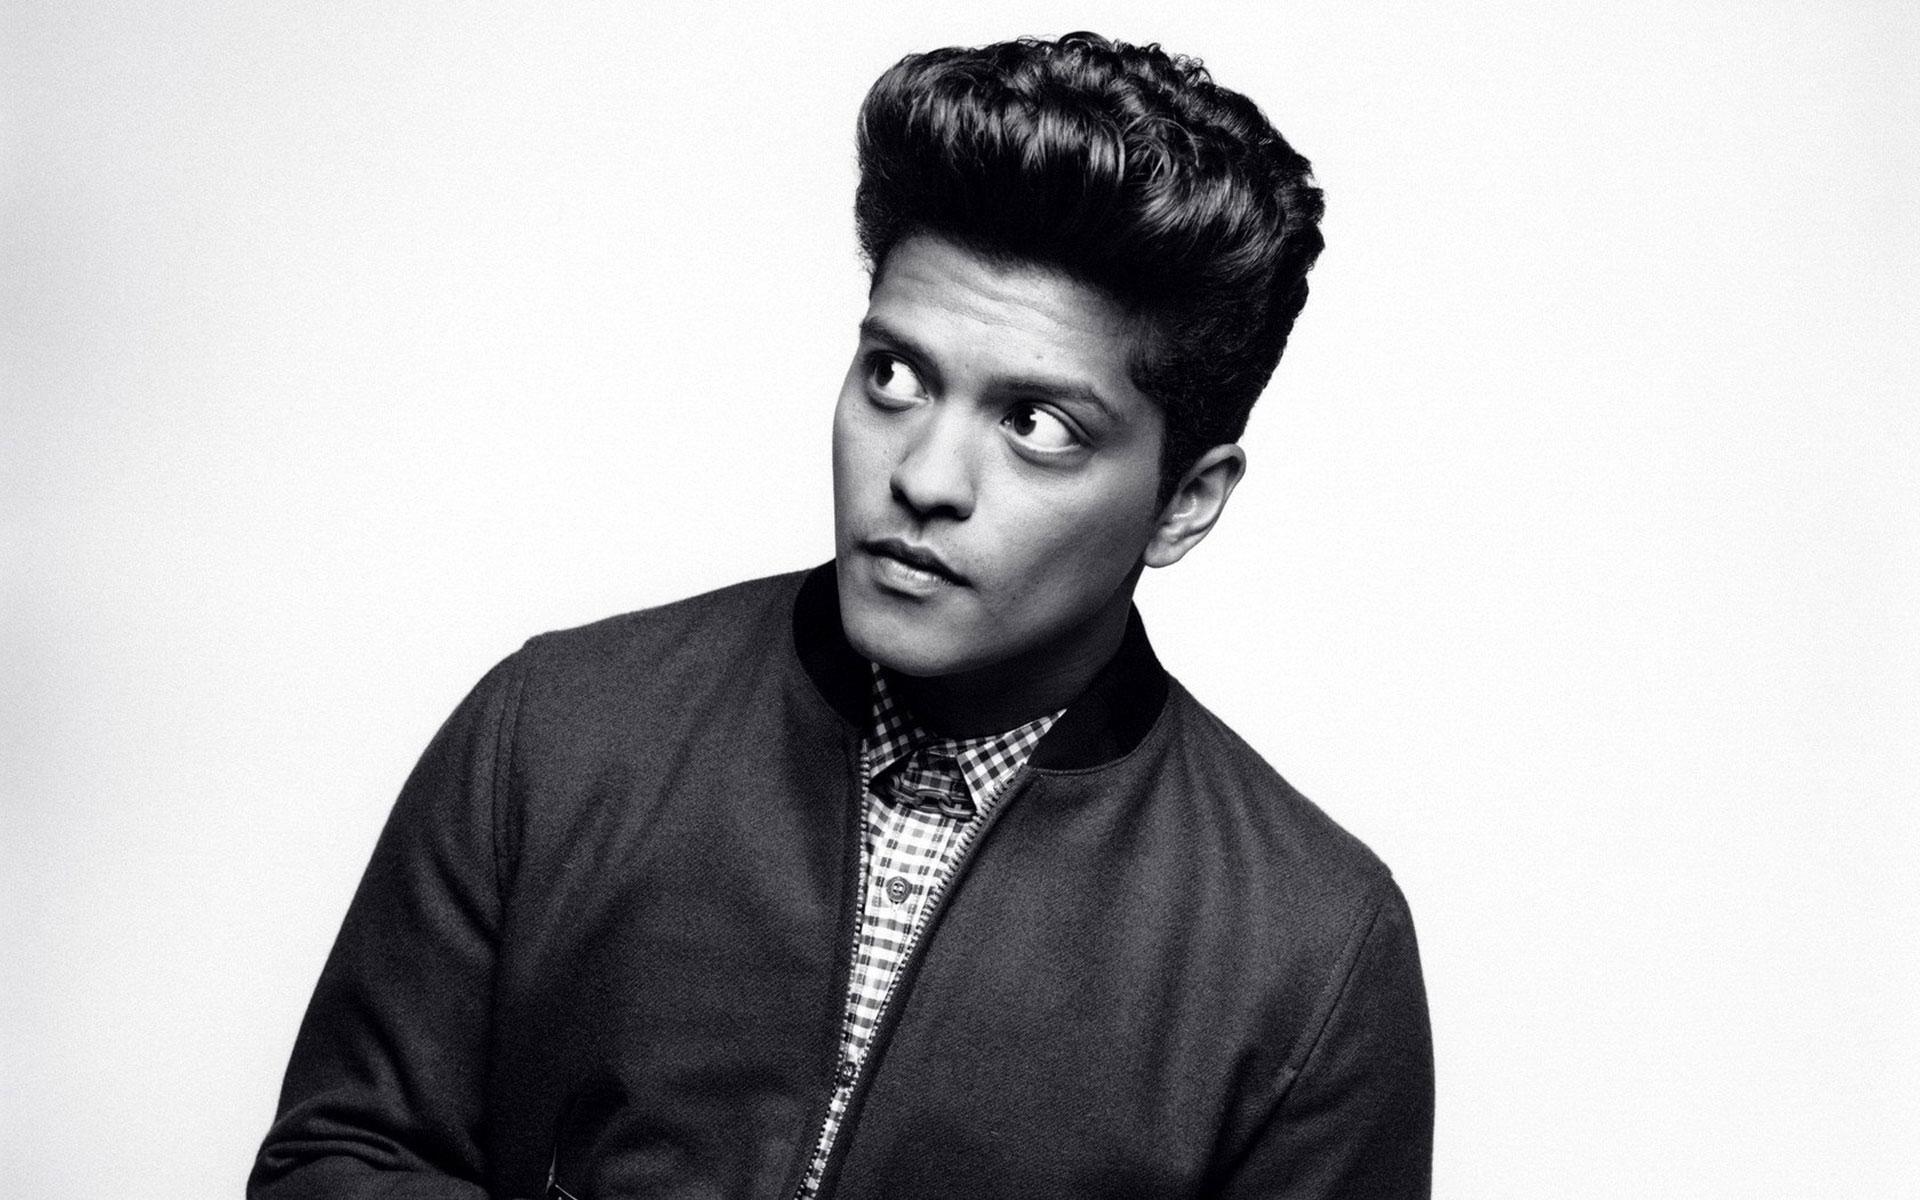 Bruno-Mars-BW-HD-Wallpaper